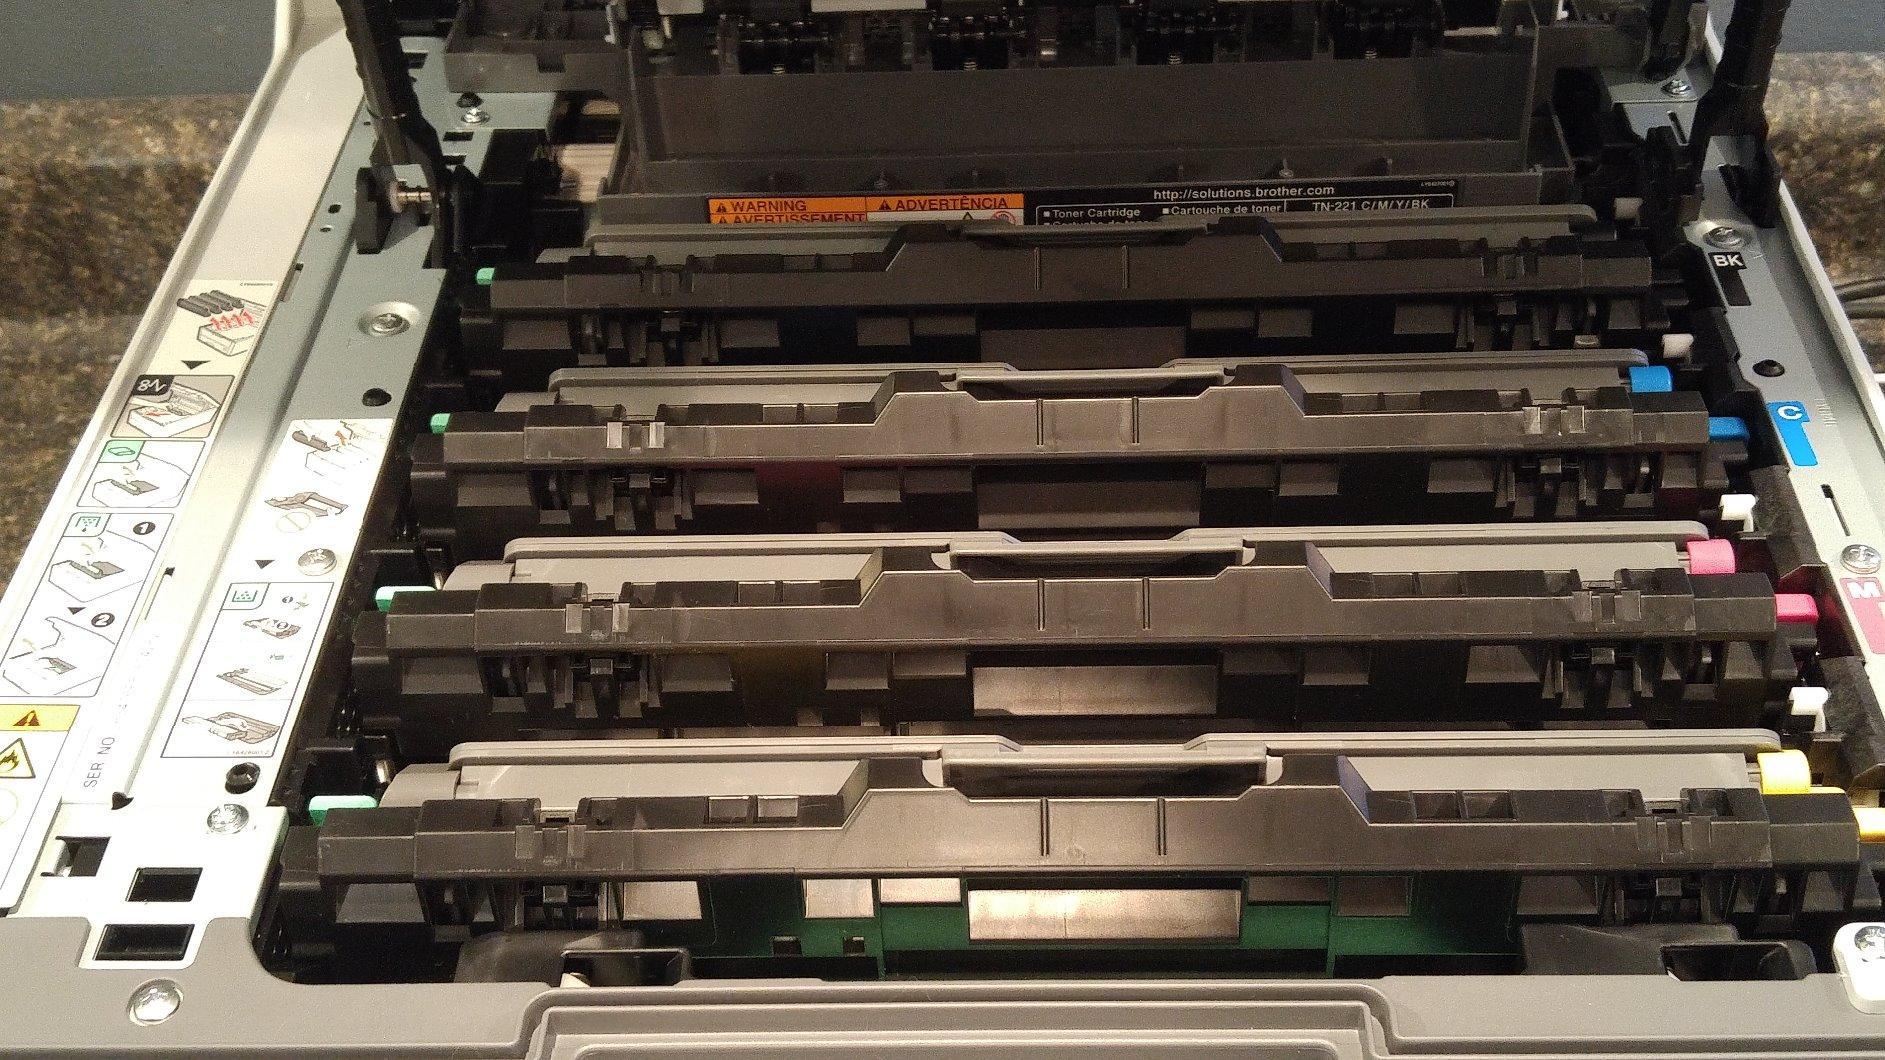 Brother HL-L3210CW Compact Digital Color Printer Providing Laser